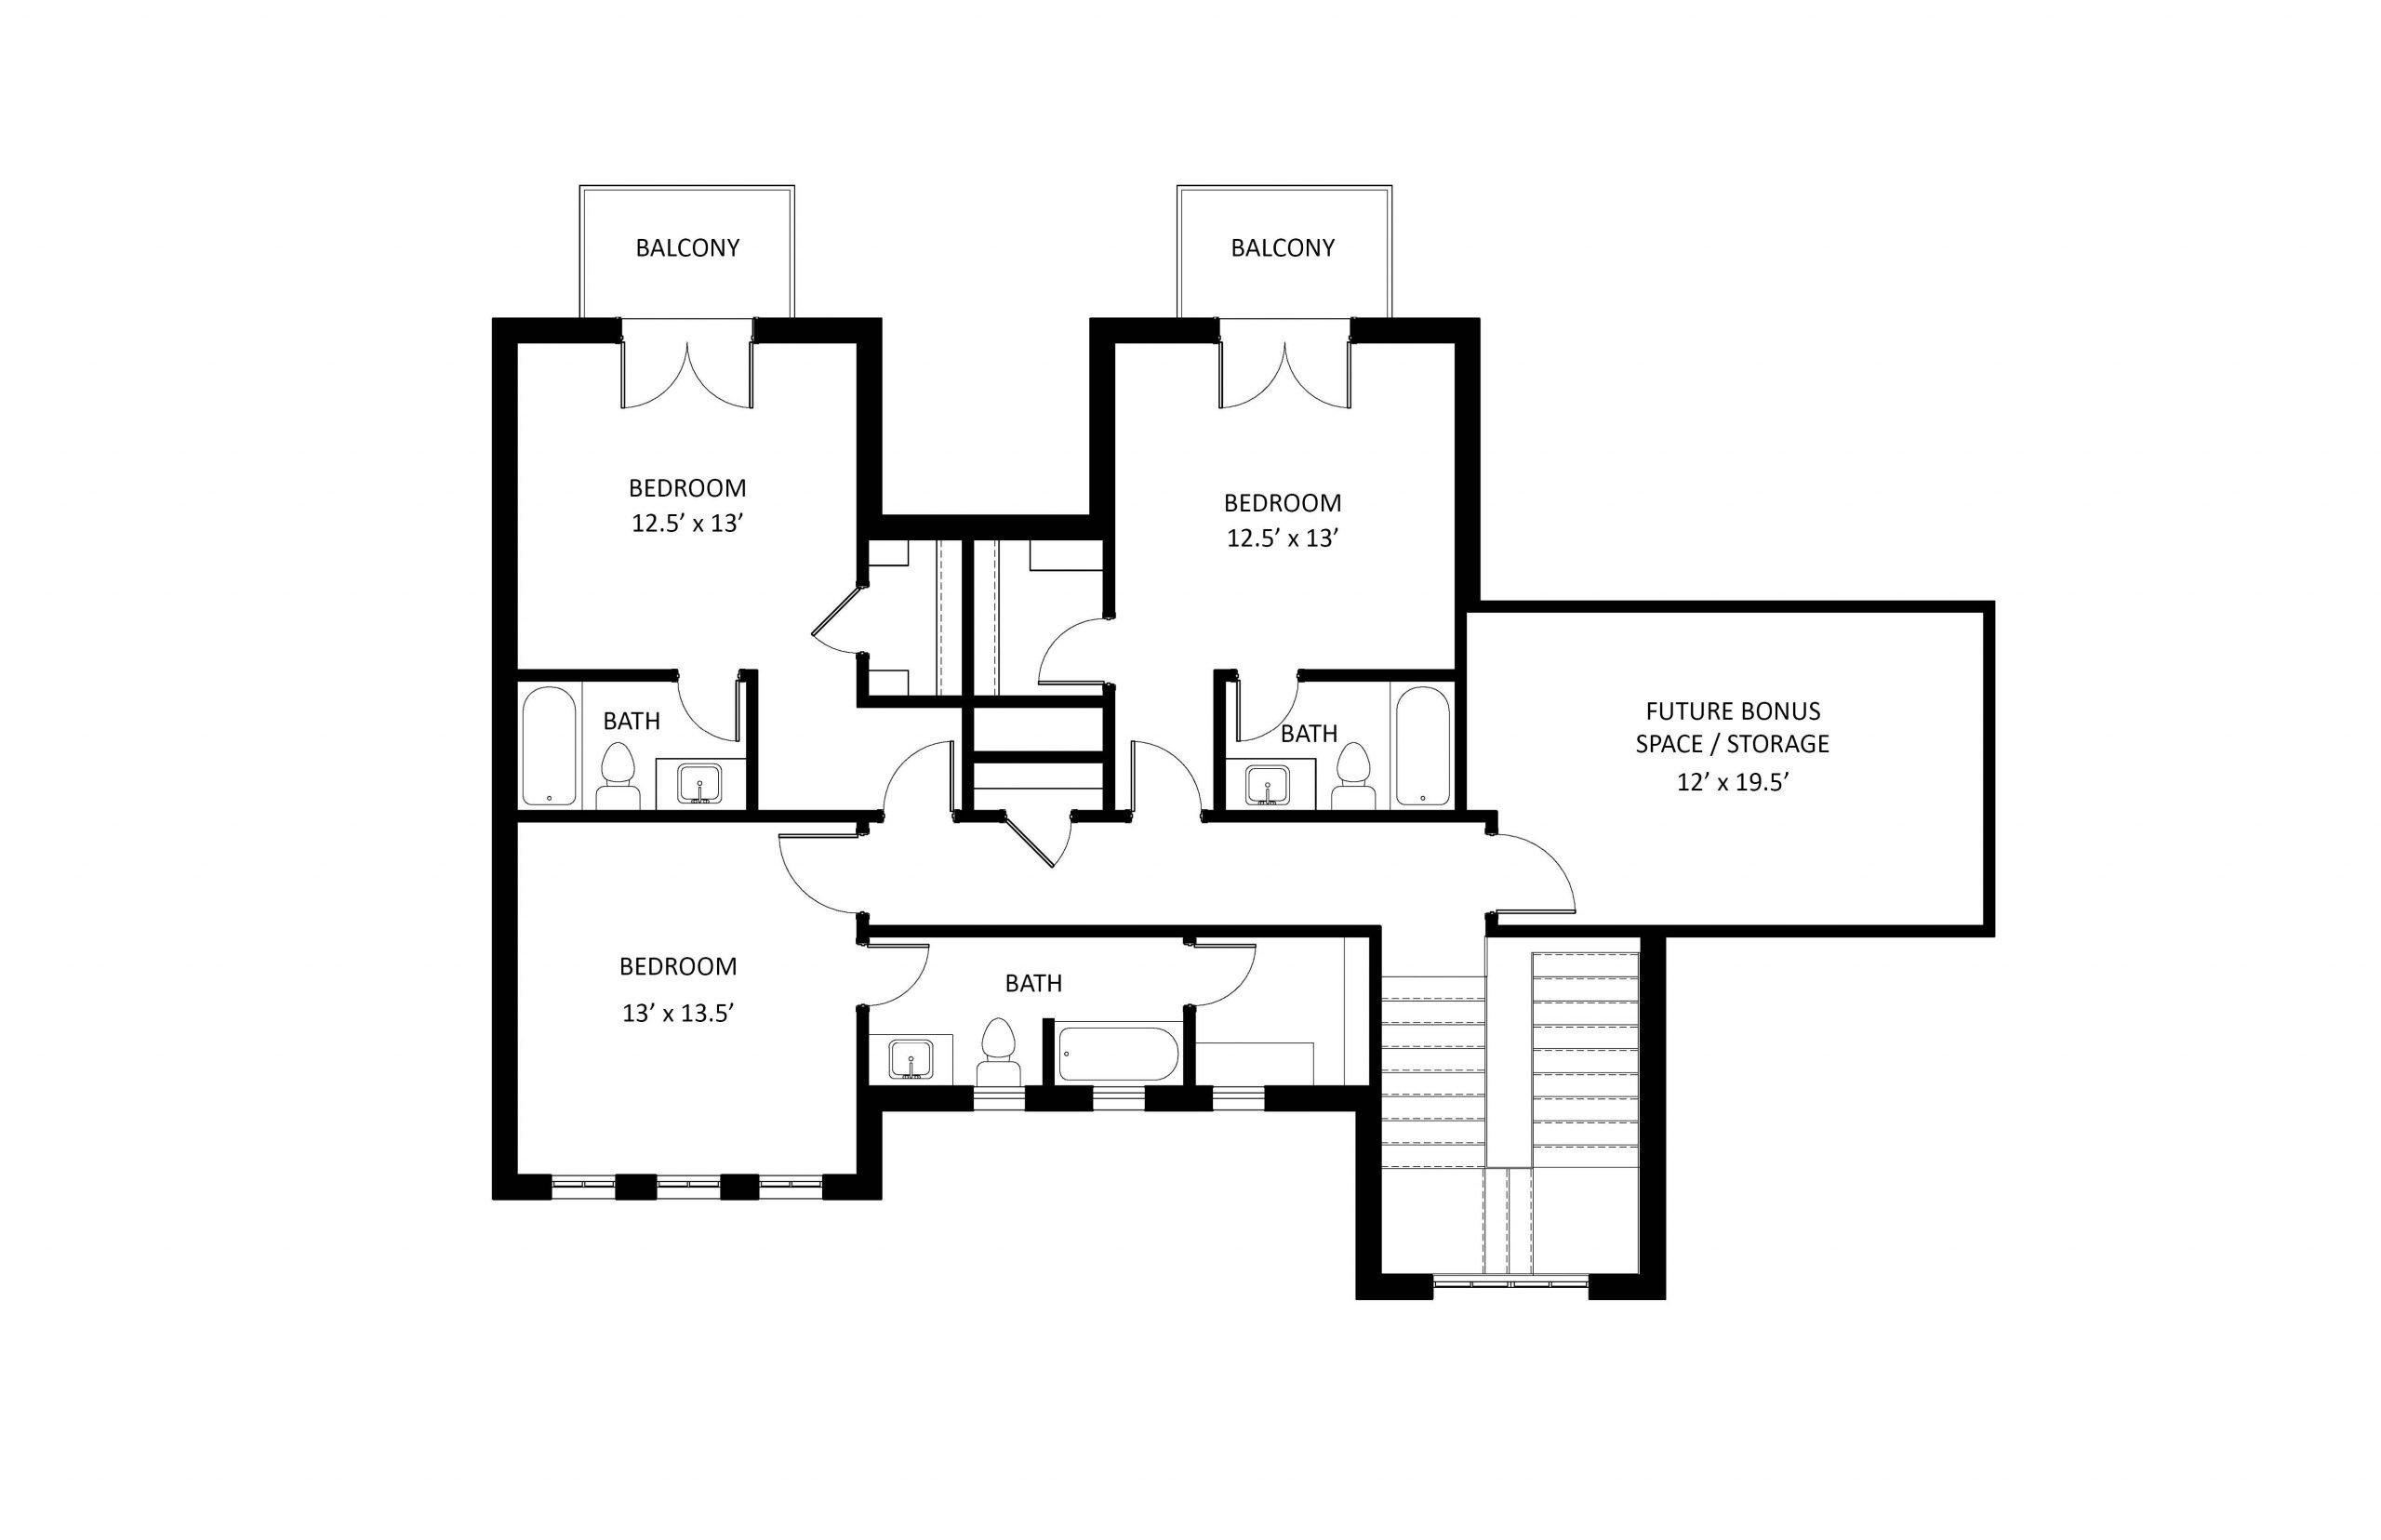 9617 Lakeway Run Floor Plans2